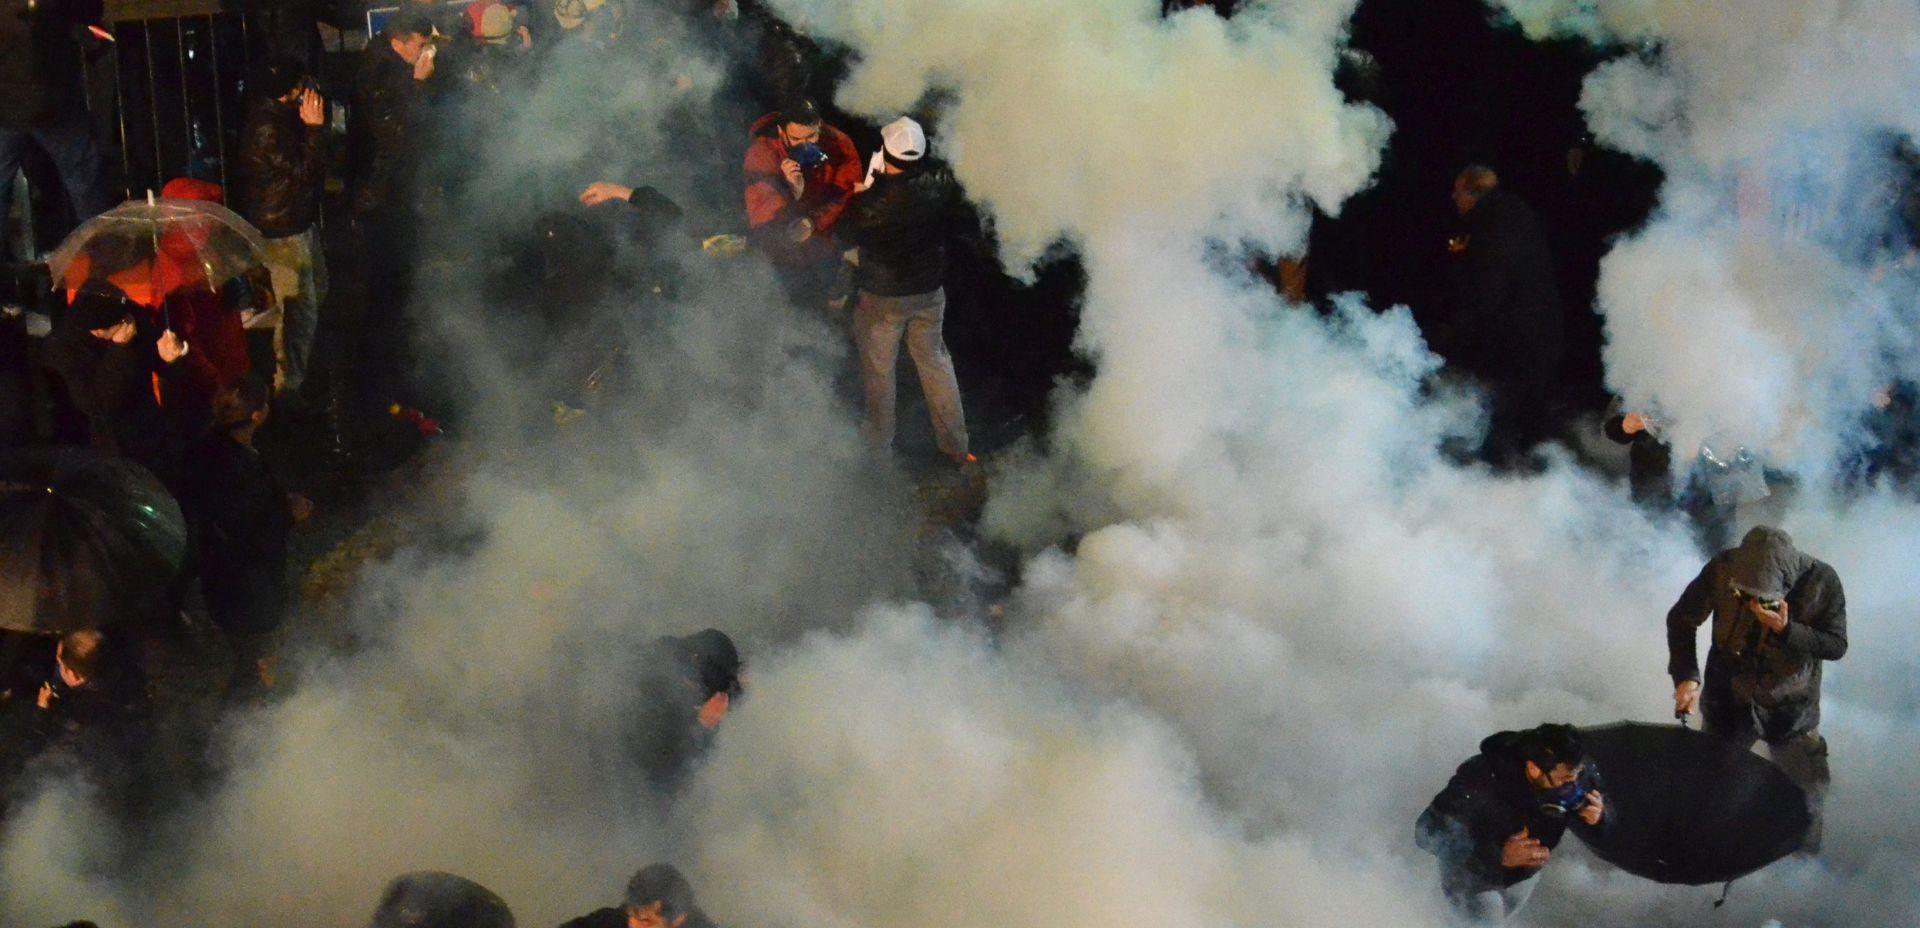 BRUTALNA CENZURA: Policija suzavcem i vodenim topovima na veliki dnevni list nesklon Erdoganu